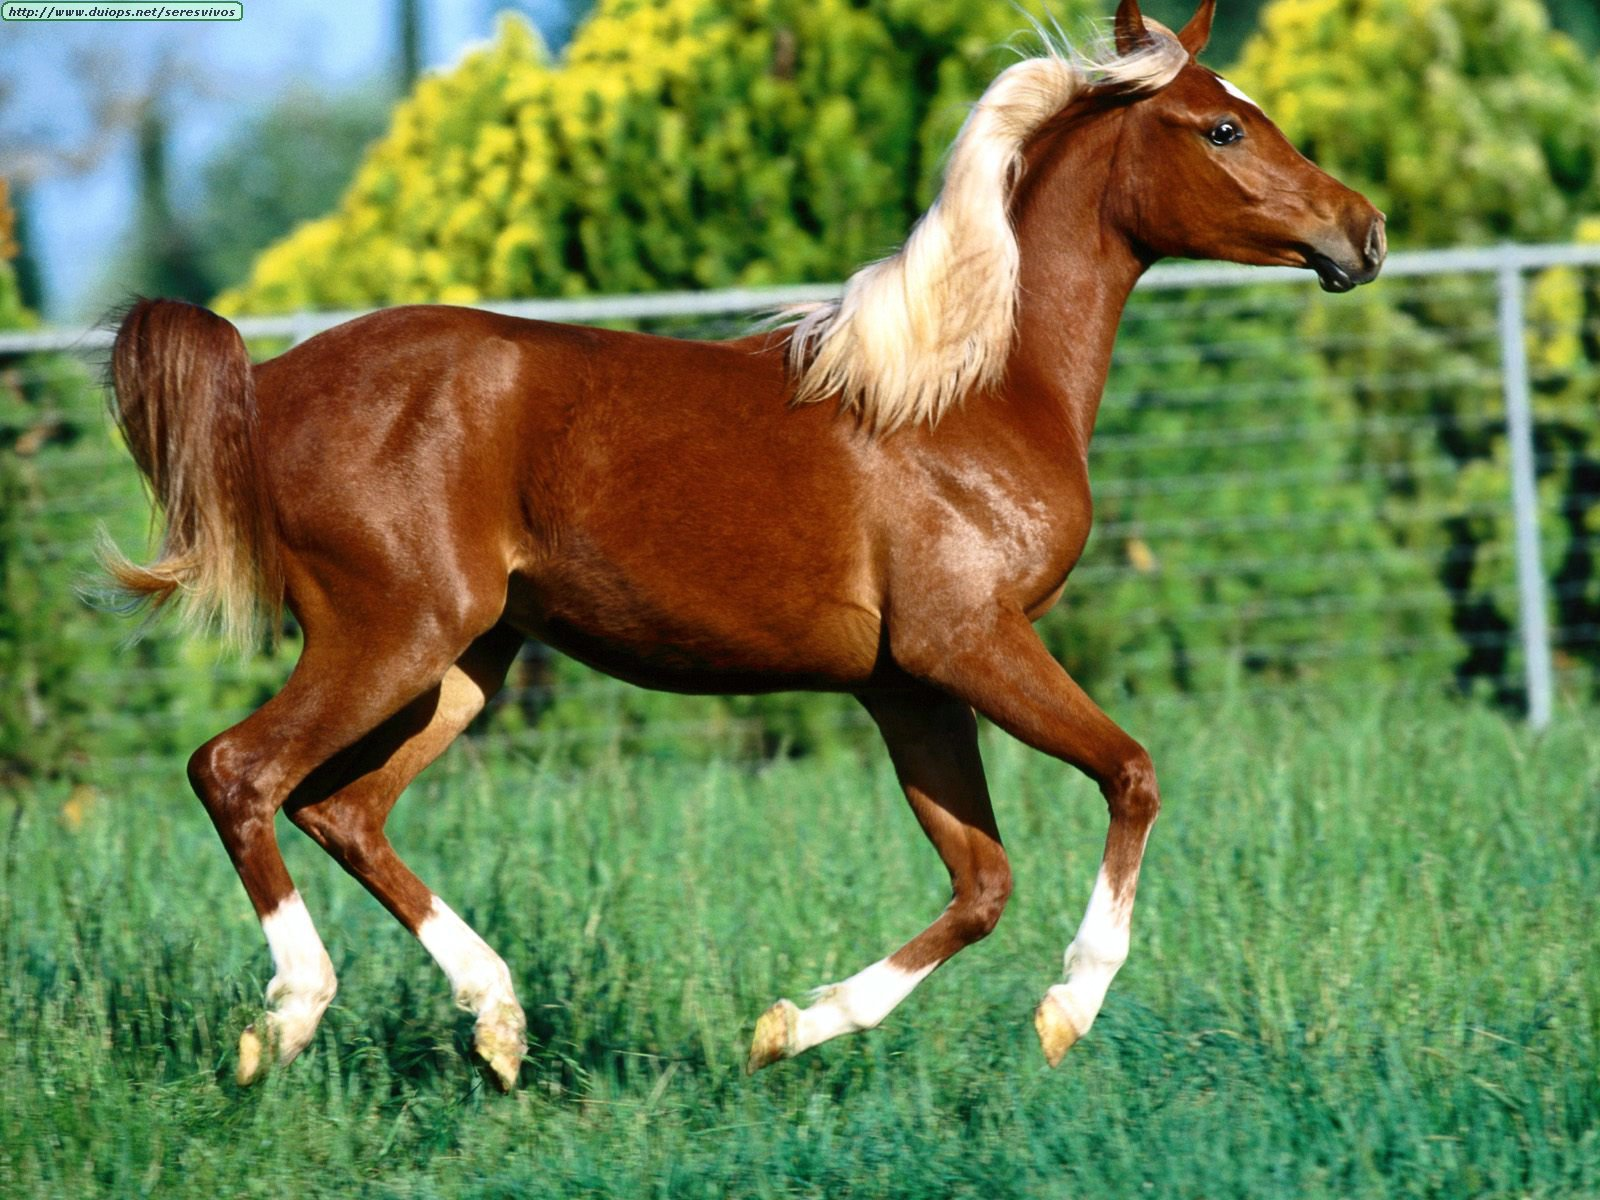 http://www.duiops.net/seresvivos/galeria/caballos/Animals%20Horses_Flames%20Flirt,%20Arabian%20Yearling.jpg